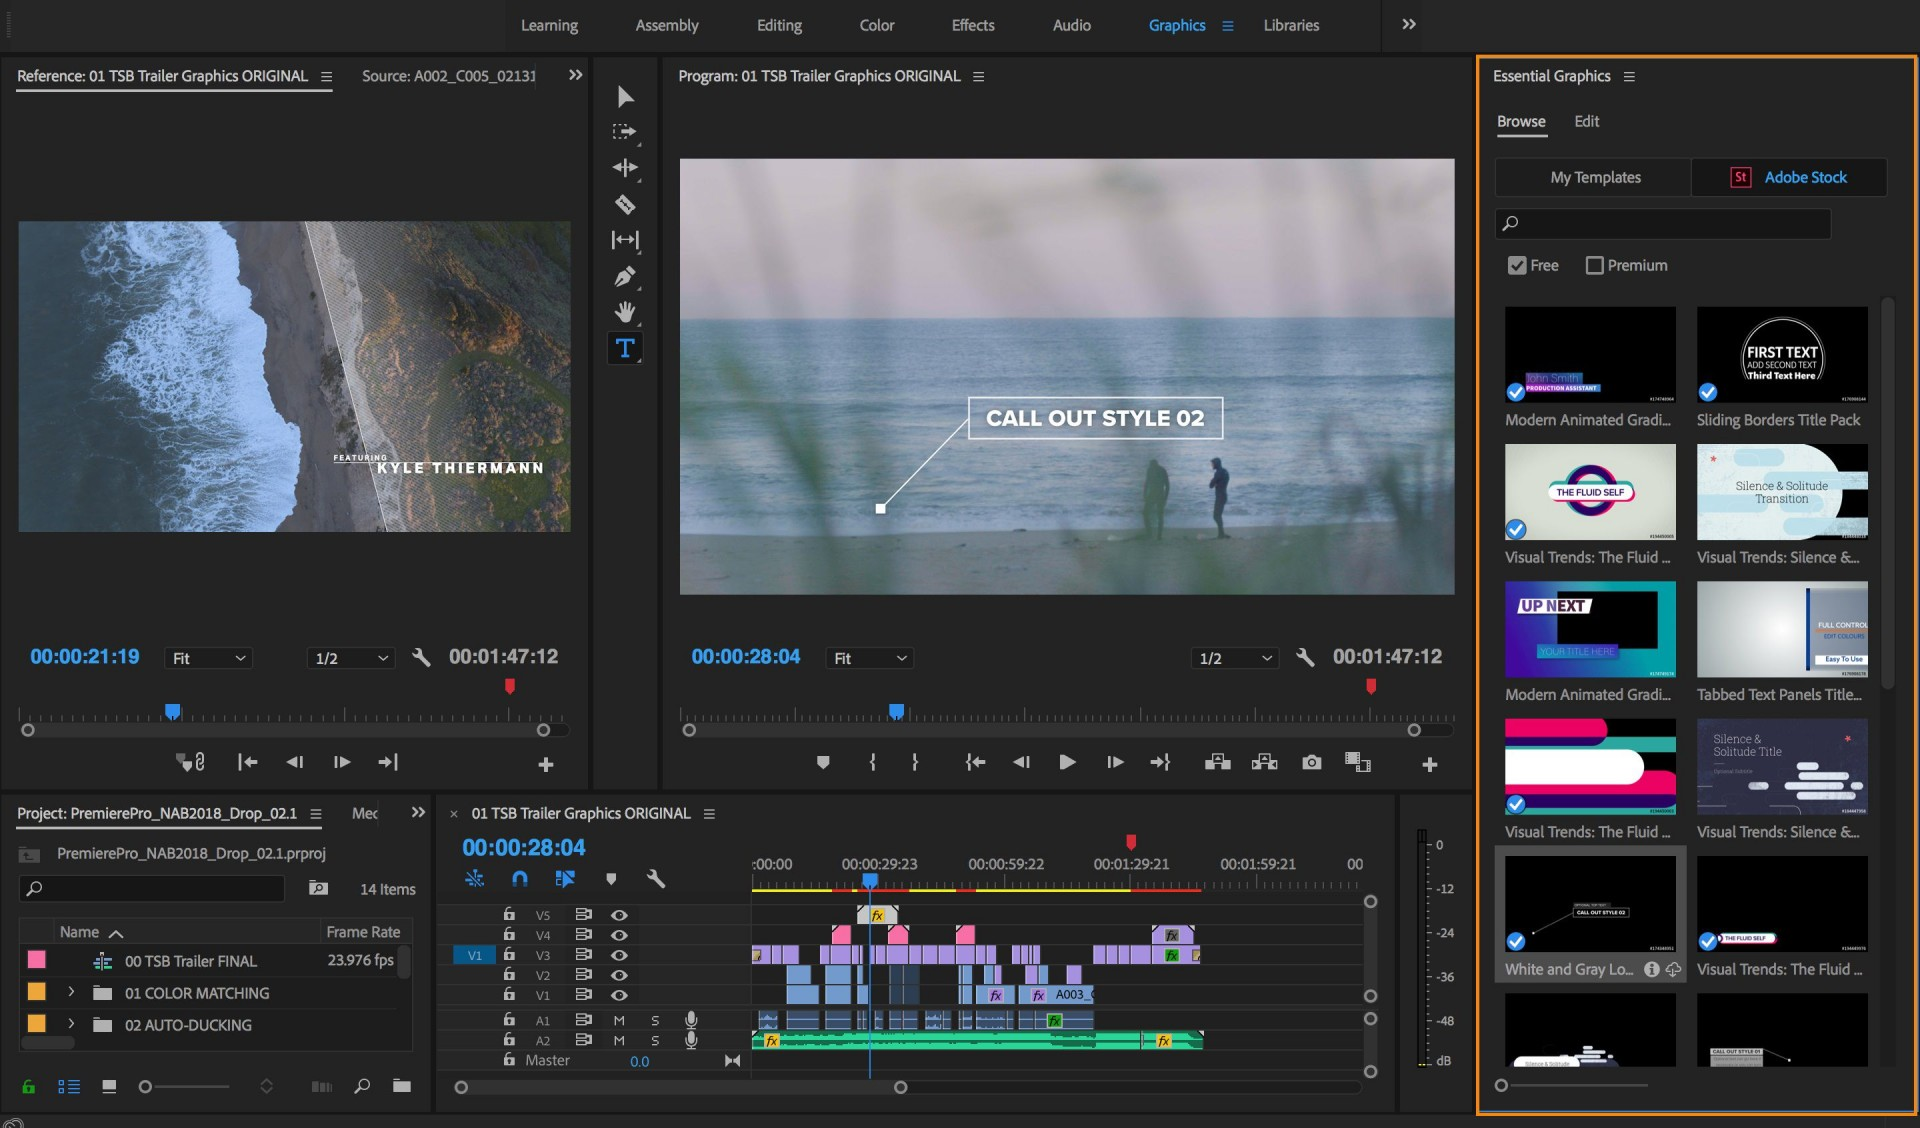 003 Beautiful Free Adobe Premiere Template Concept  Templates Pro Intro Rush Wedding Video1920